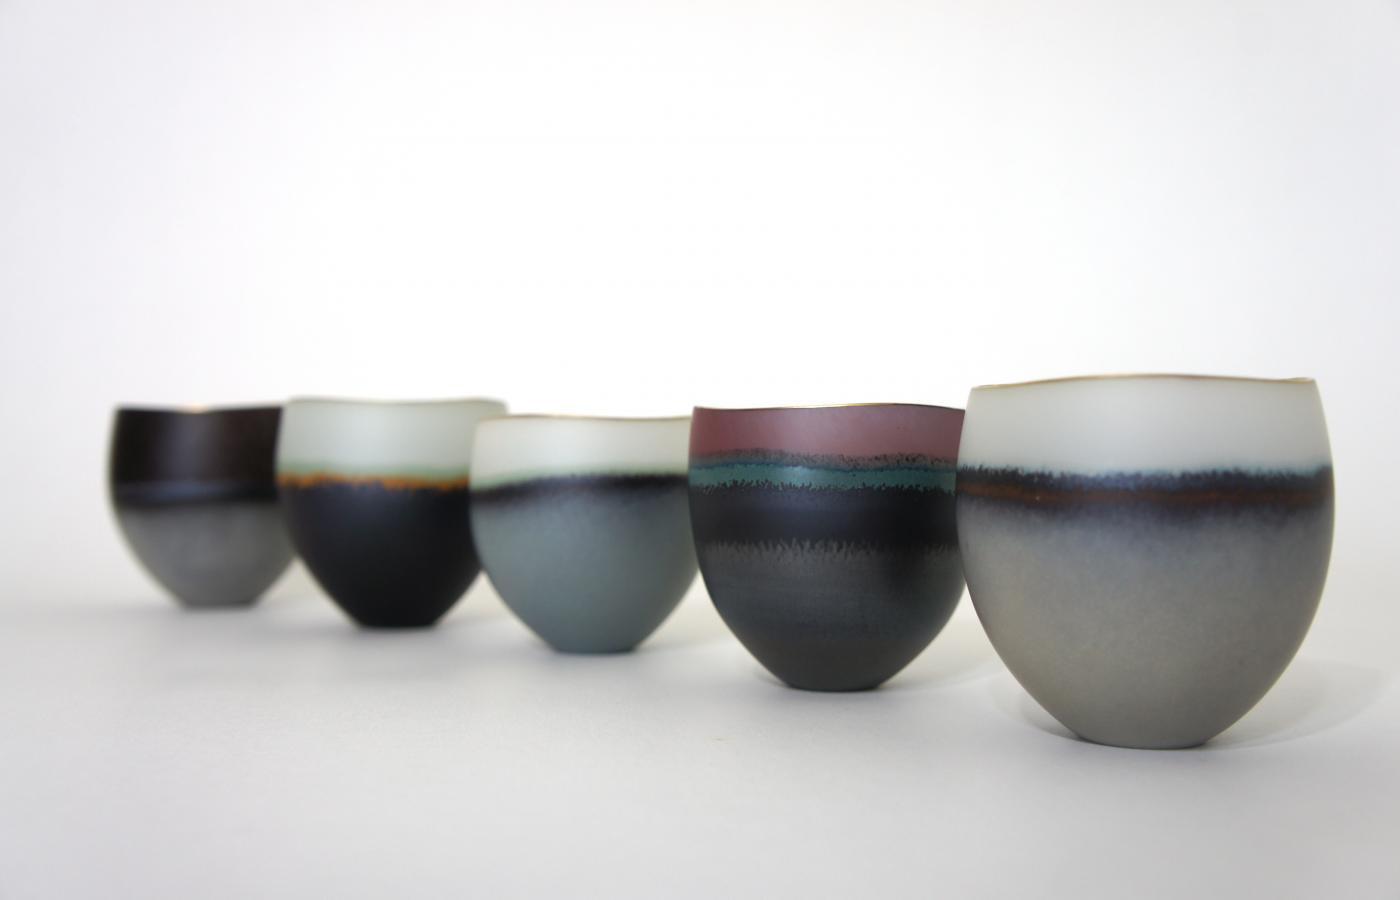 st louis crystal france vase of https www admagazine fr design actualite design diaporama un with regard to dsc08871 jpg 842 jpeg 9126